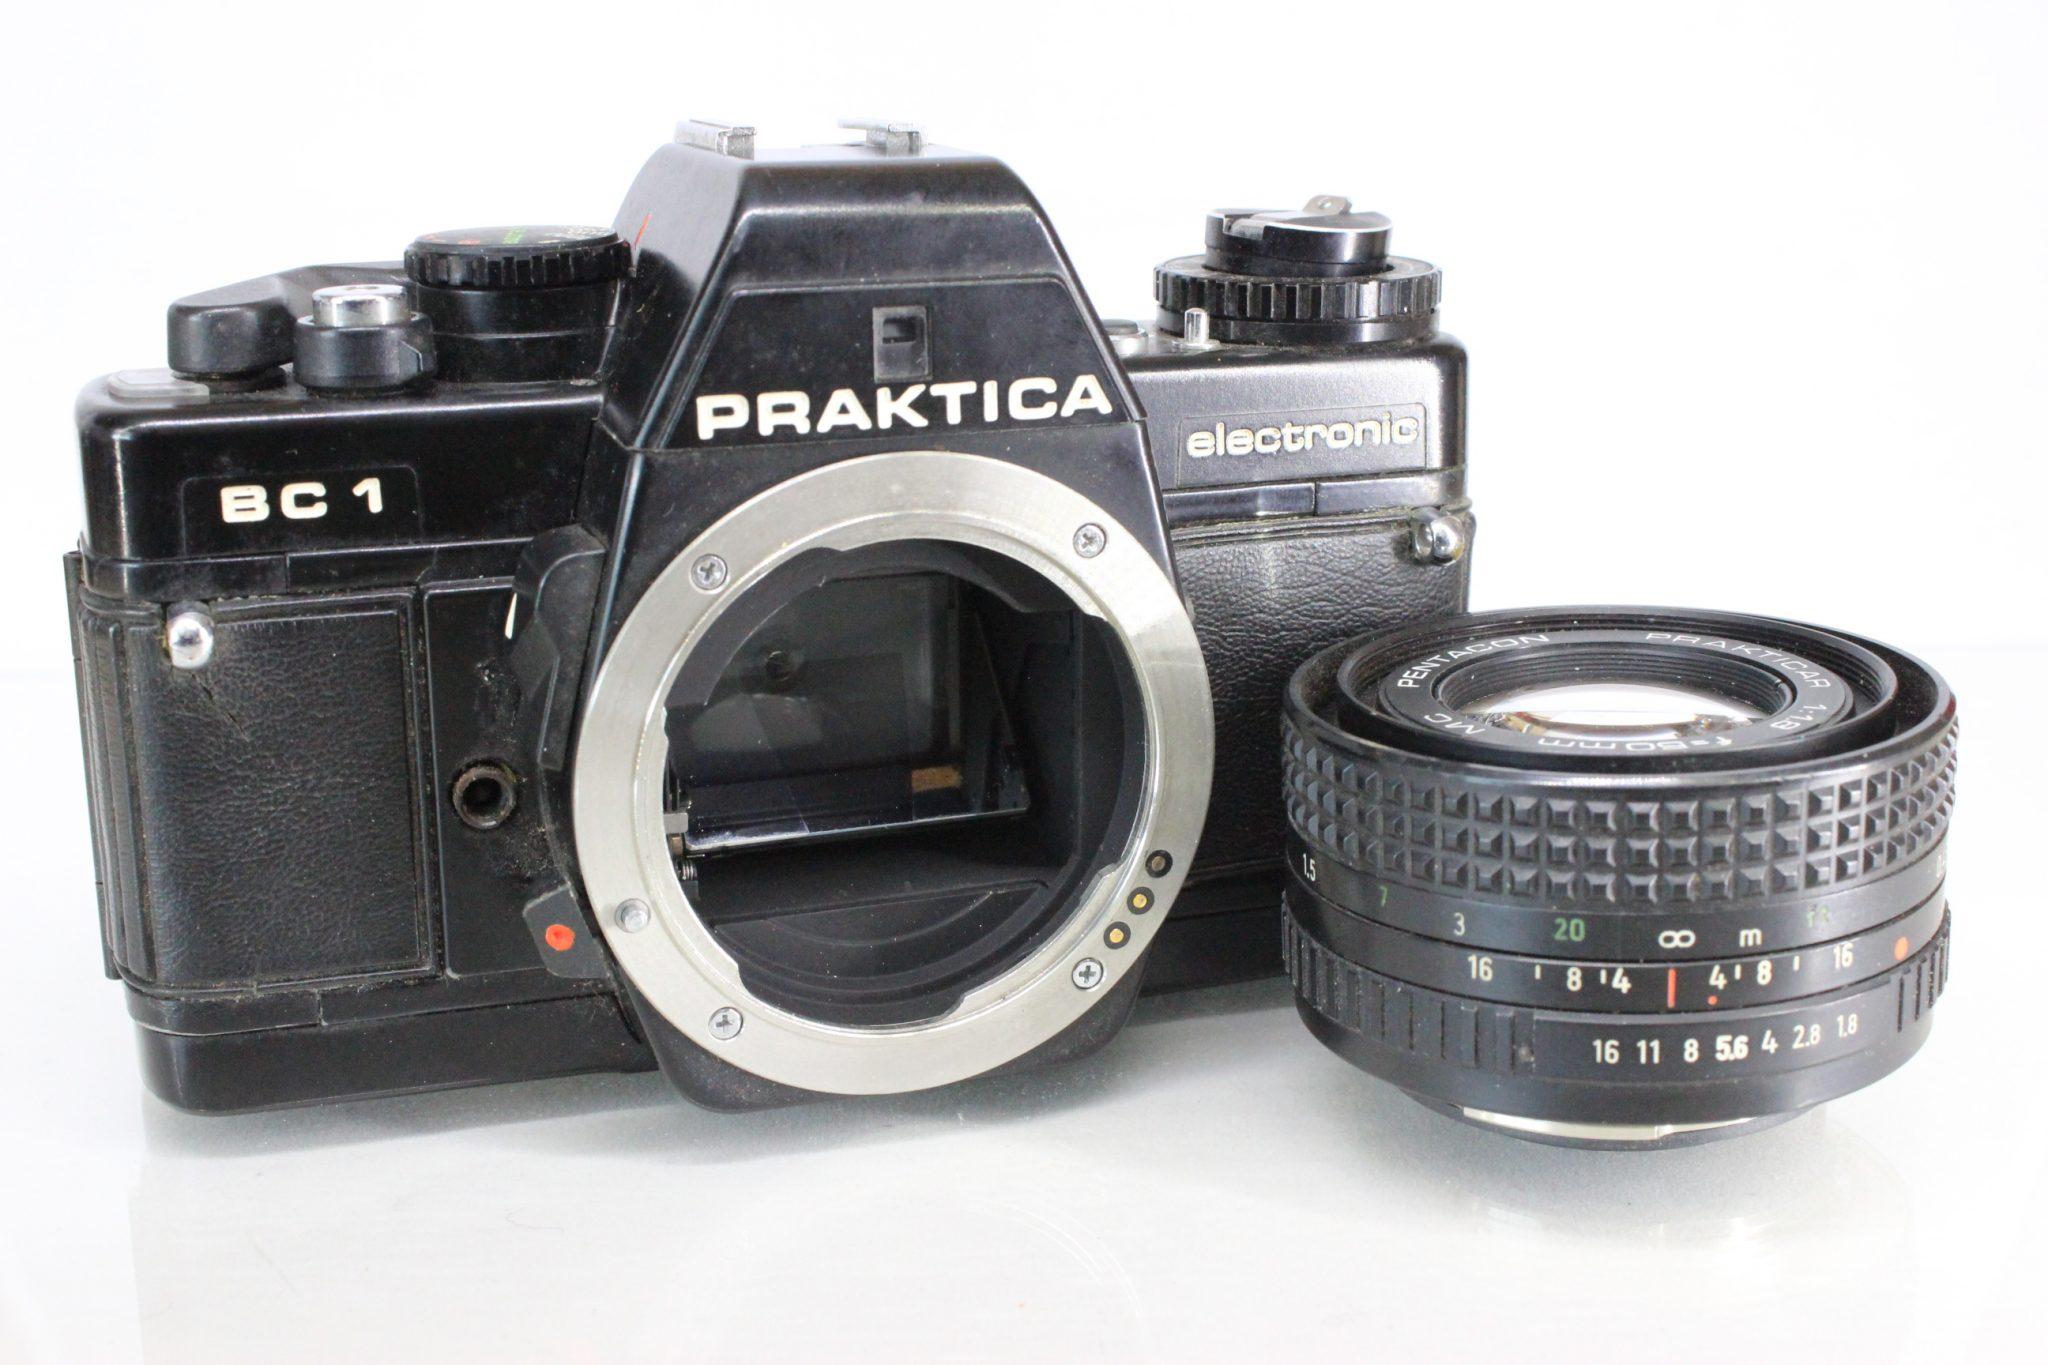 Praktica mtl b slr camera review casual photophile